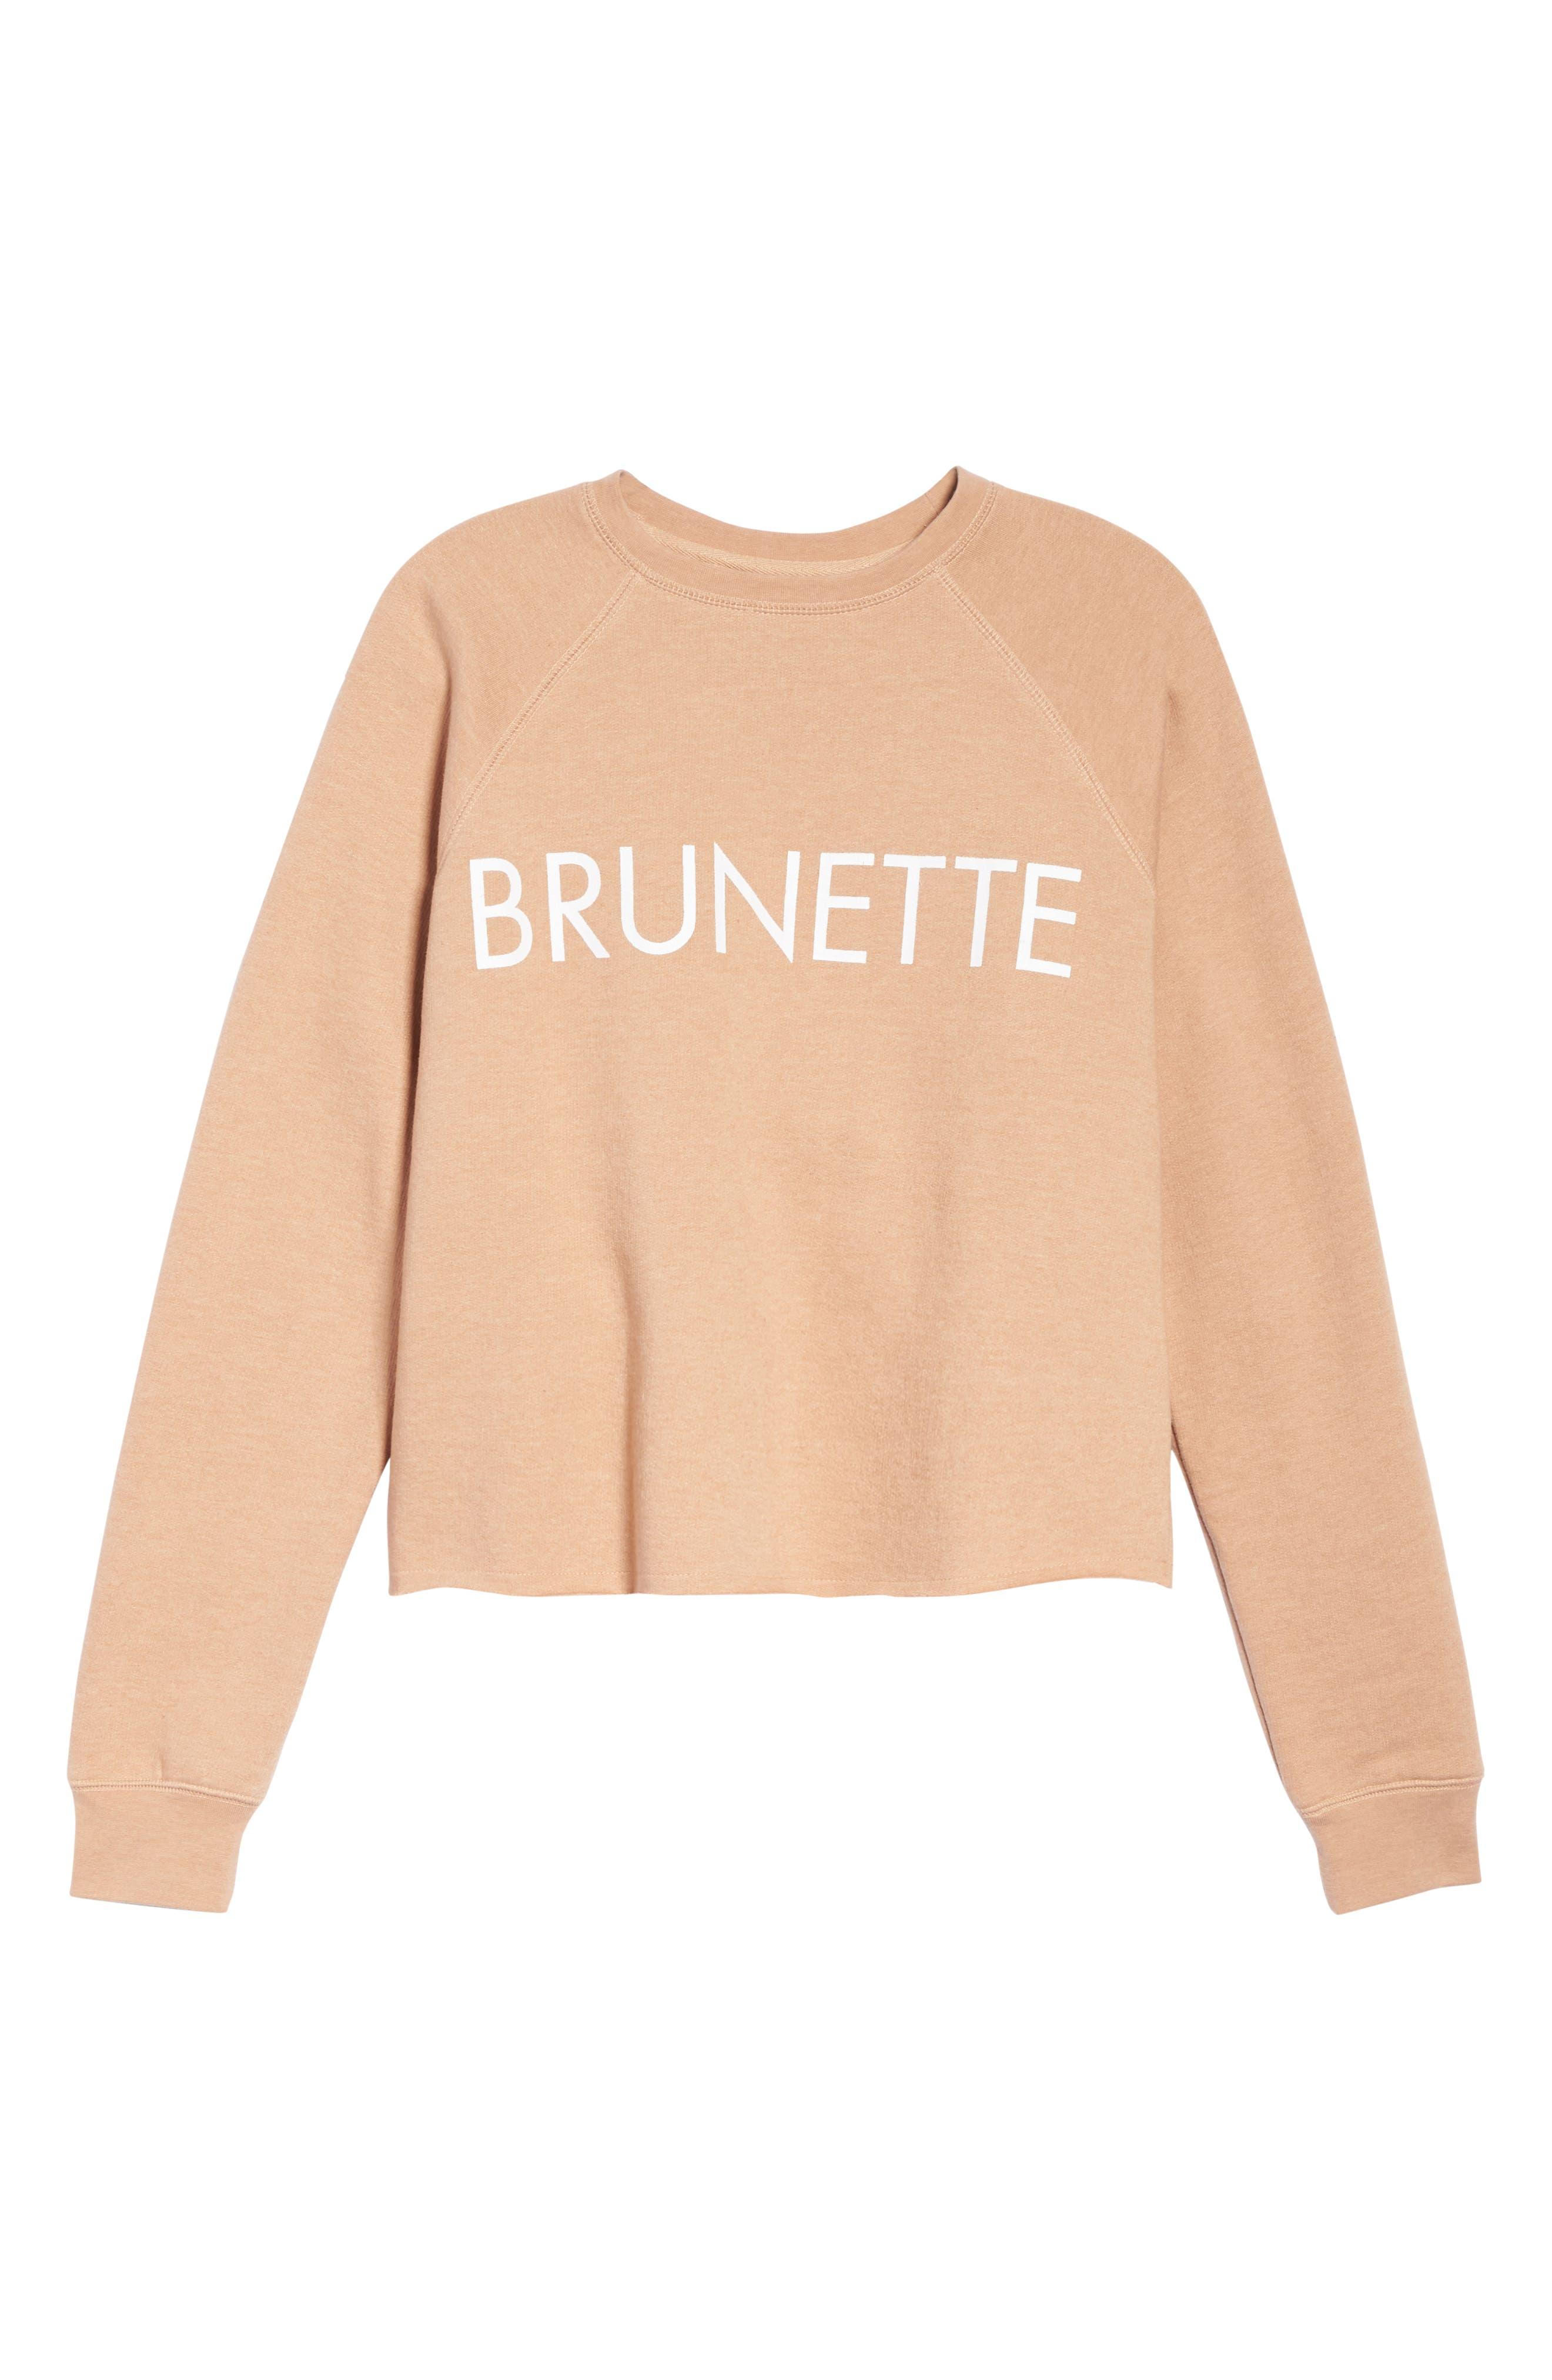 Middle Sister Brunette Sweatshirt,                             Alternate thumbnail 4, color,                             Rose